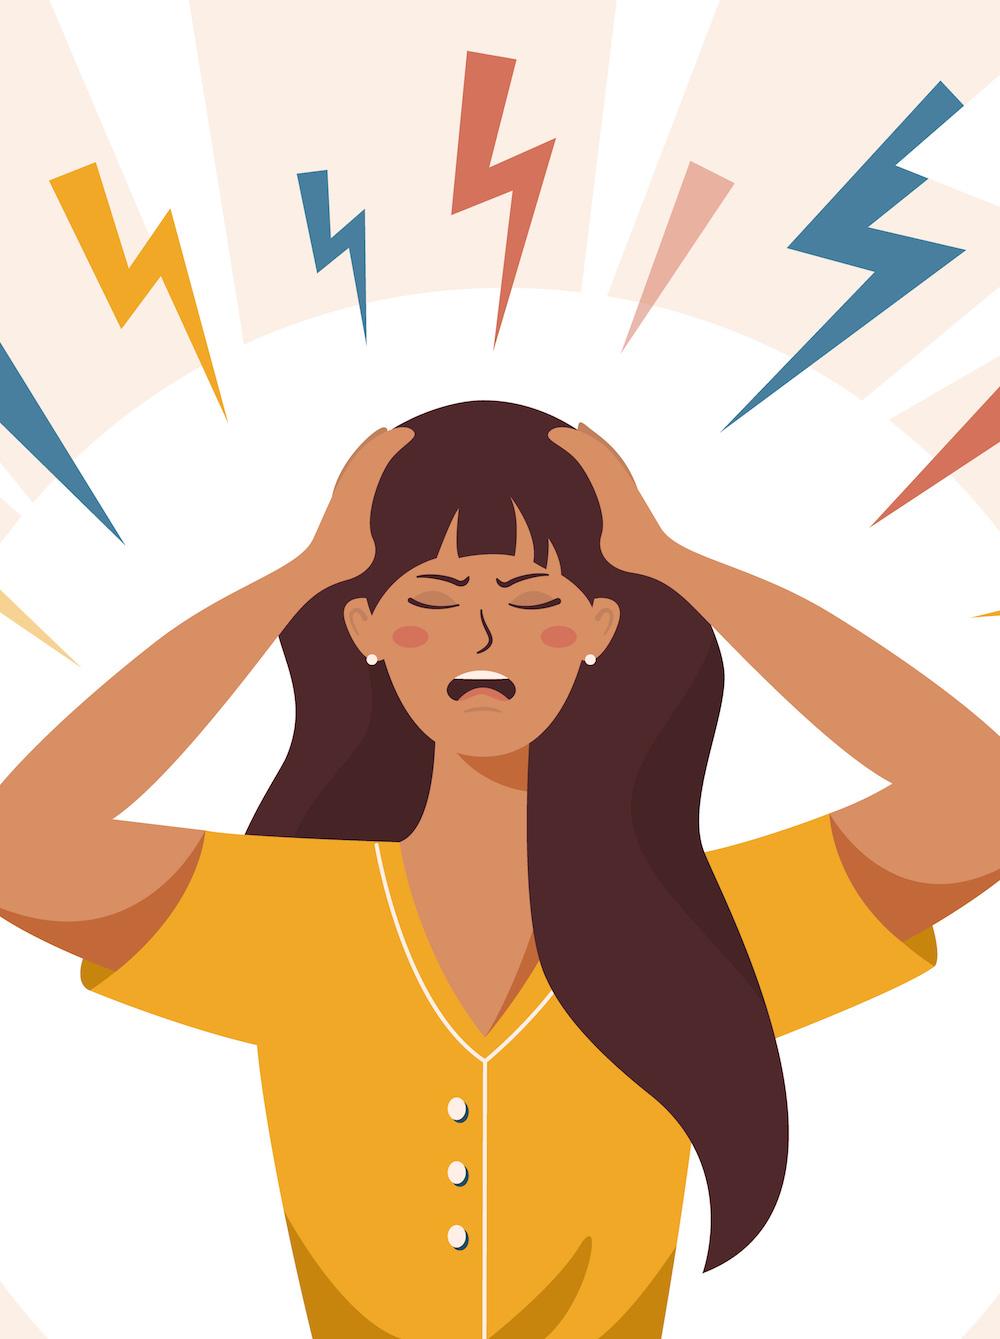 Illustration frau hat starke Kopfschmerzen hält sich den Kopf